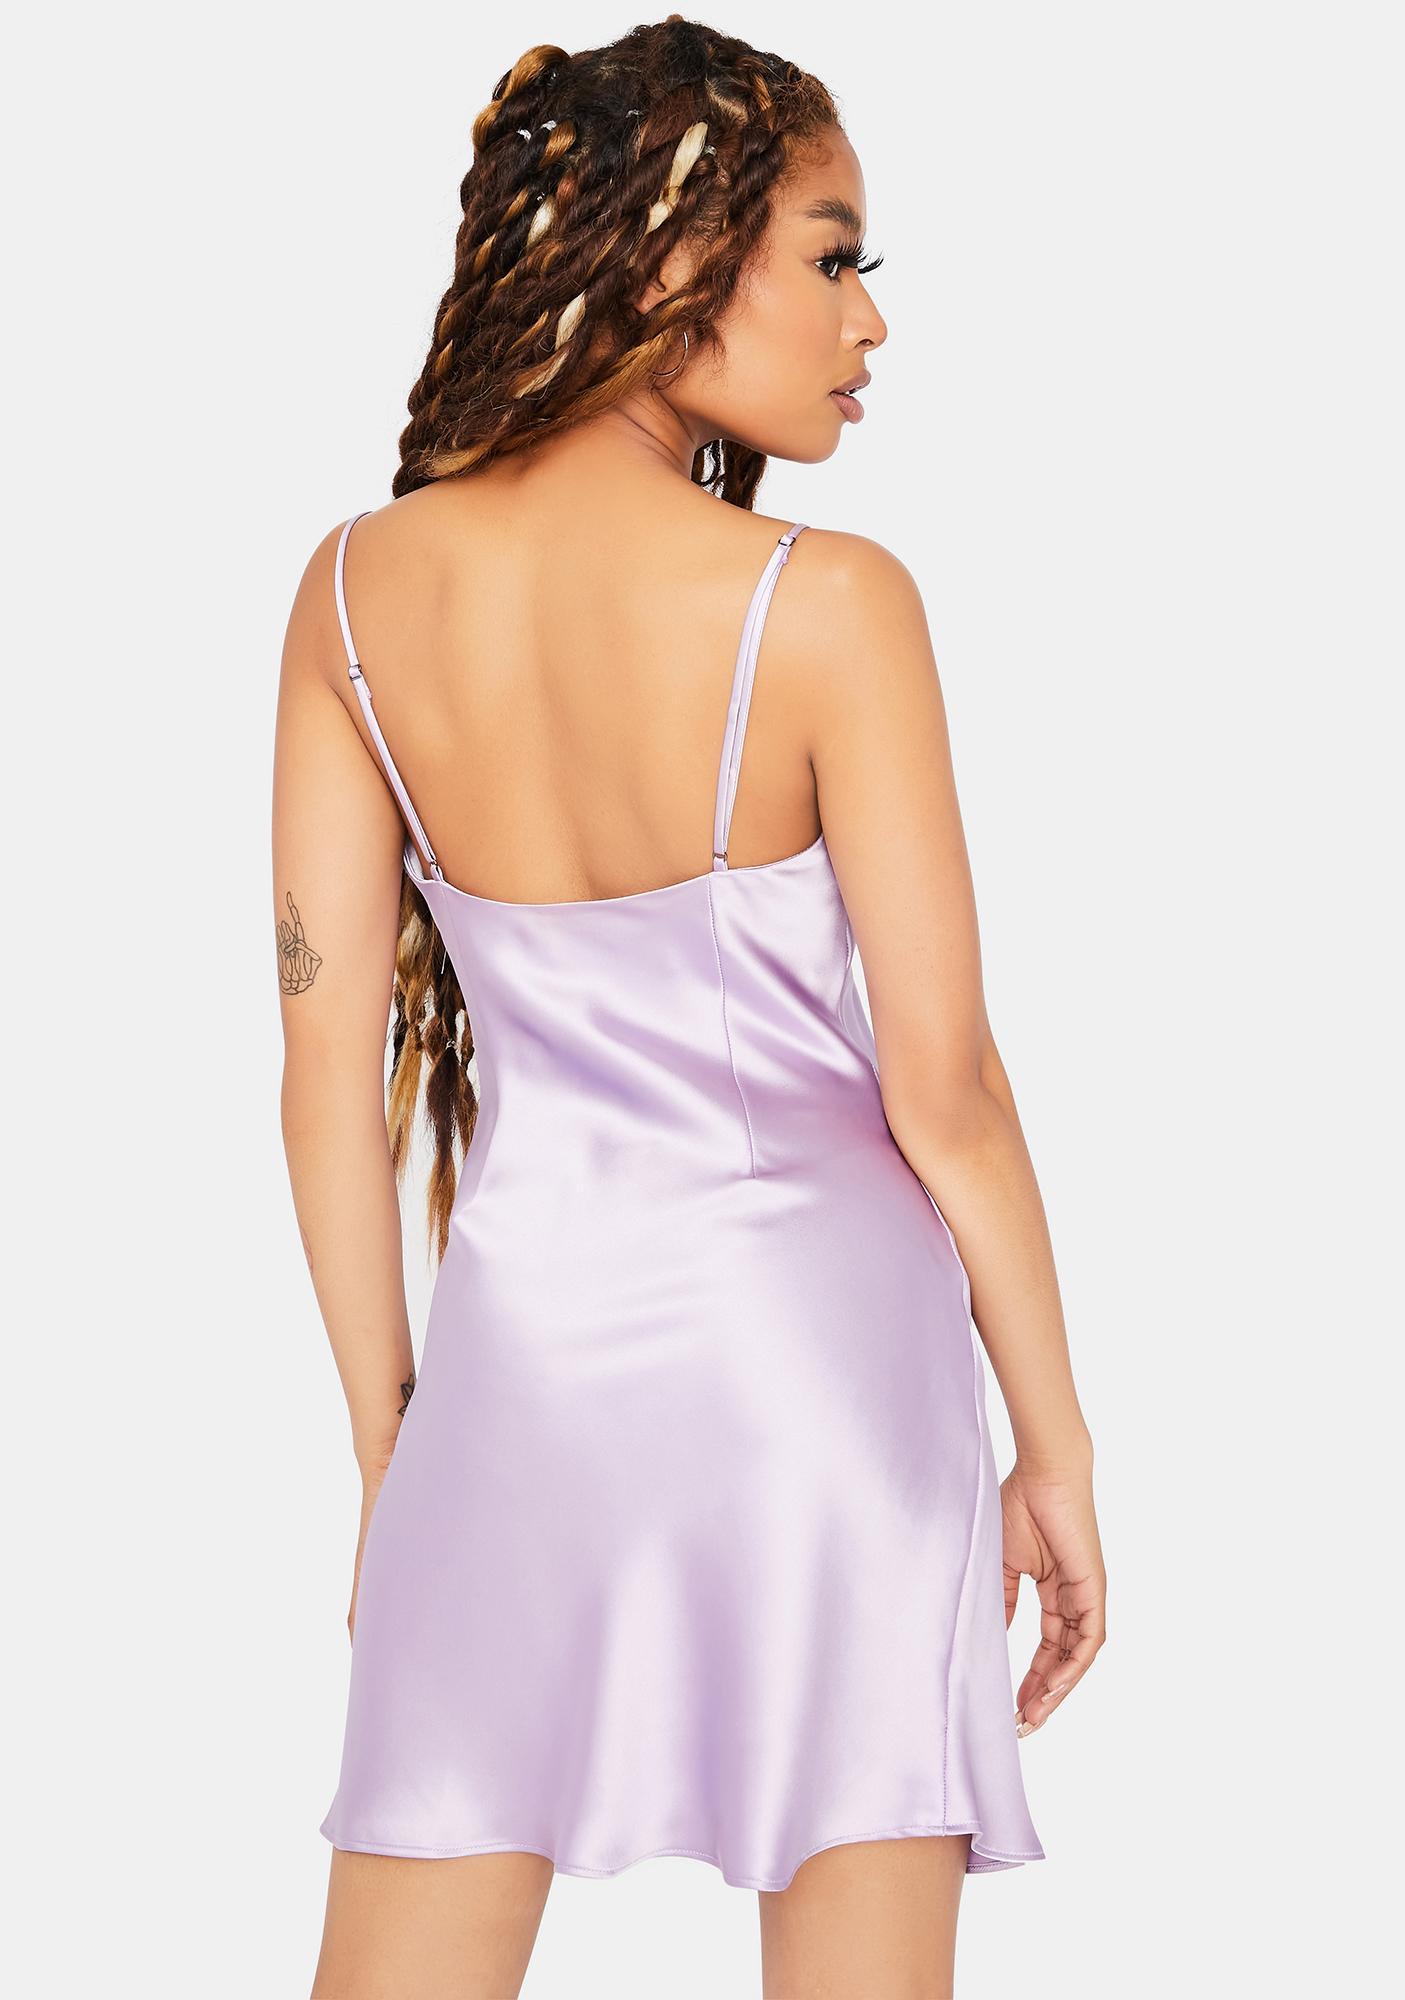 Iris Champagne All Day Satin Dress